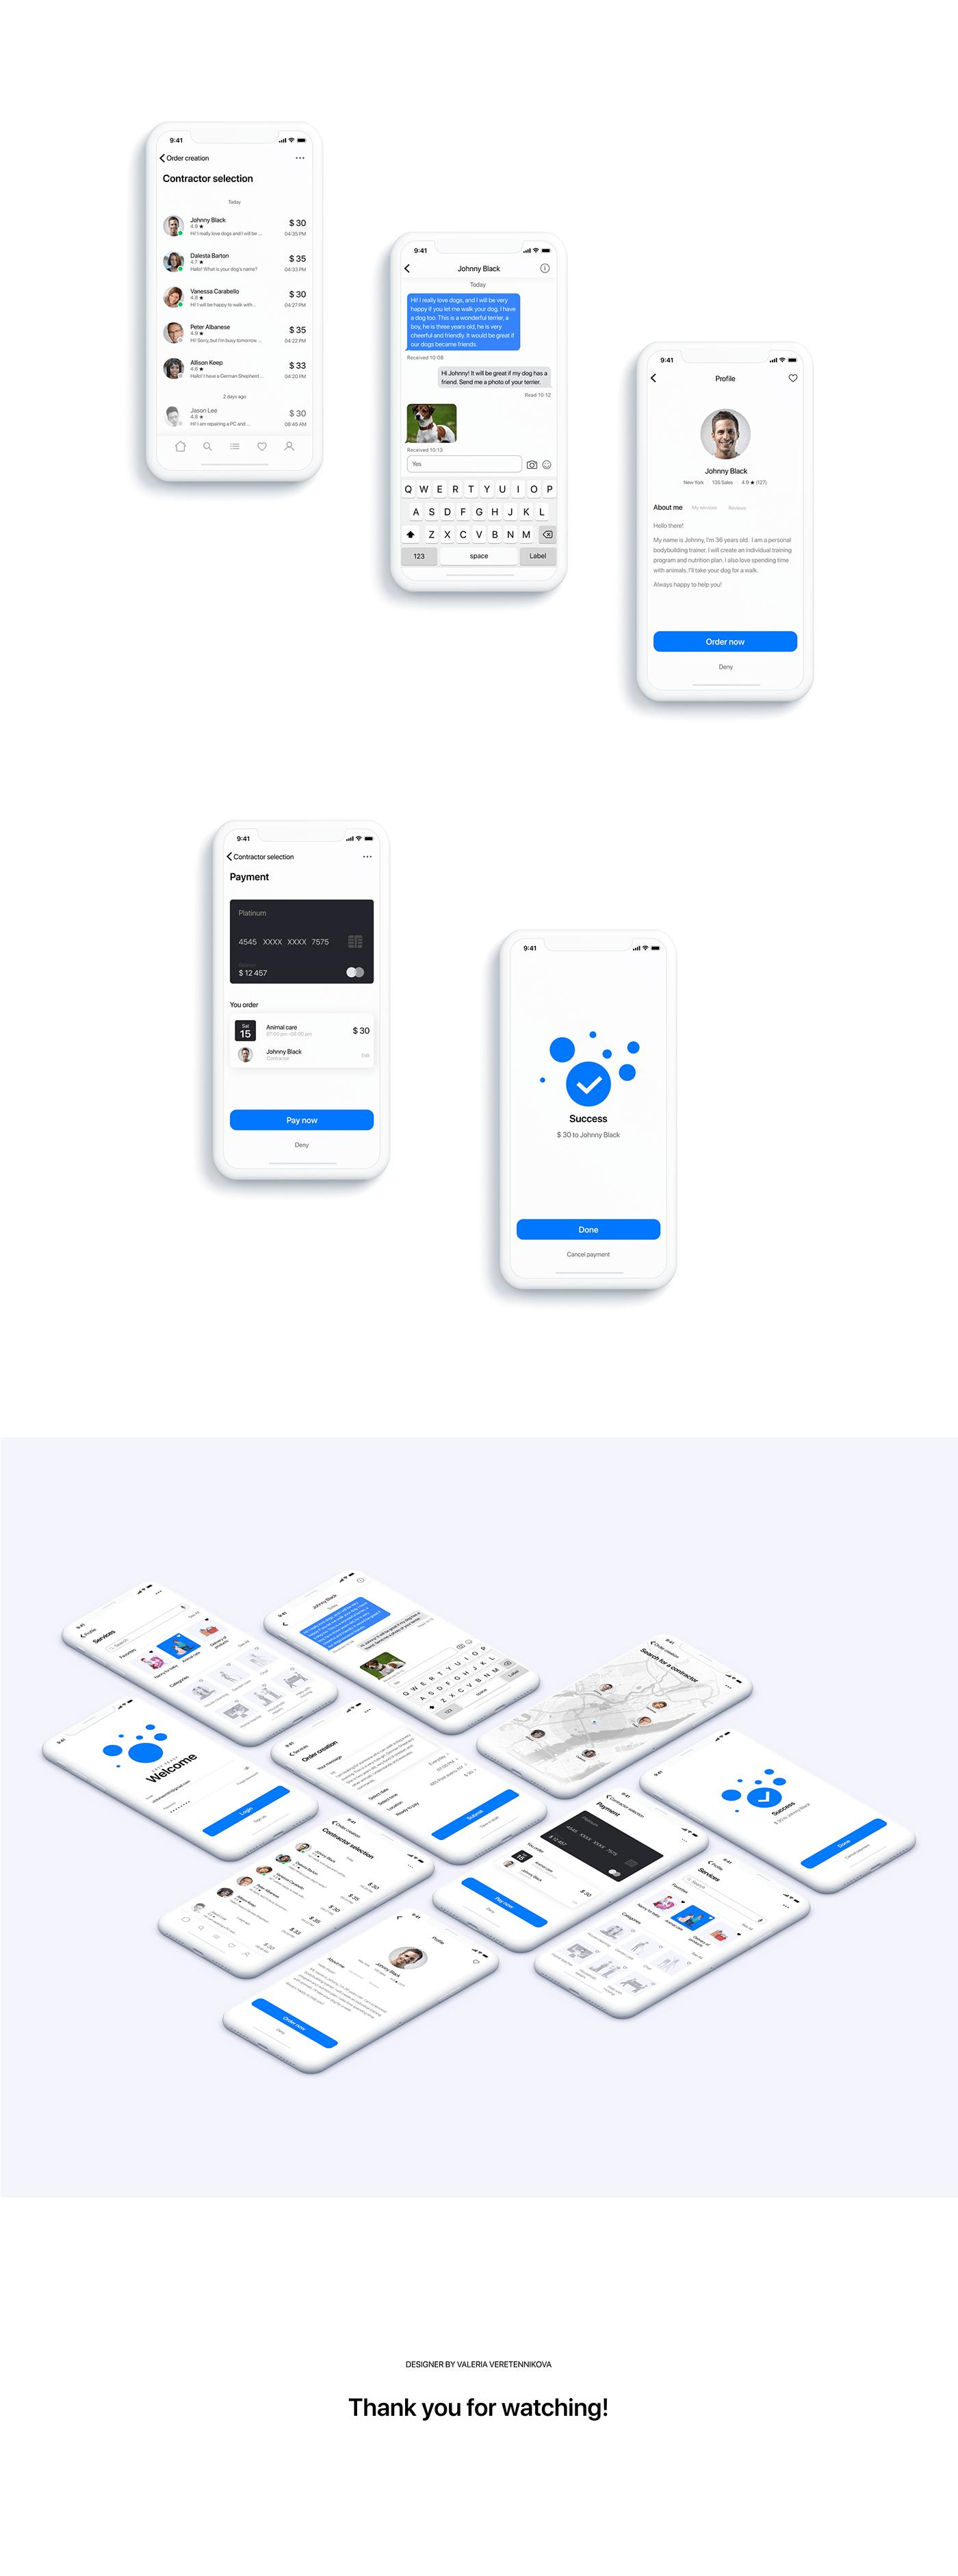 interaction ux/ui UI/UX Design app design app concept ux/ui concept ios animation  product design  Mobile app